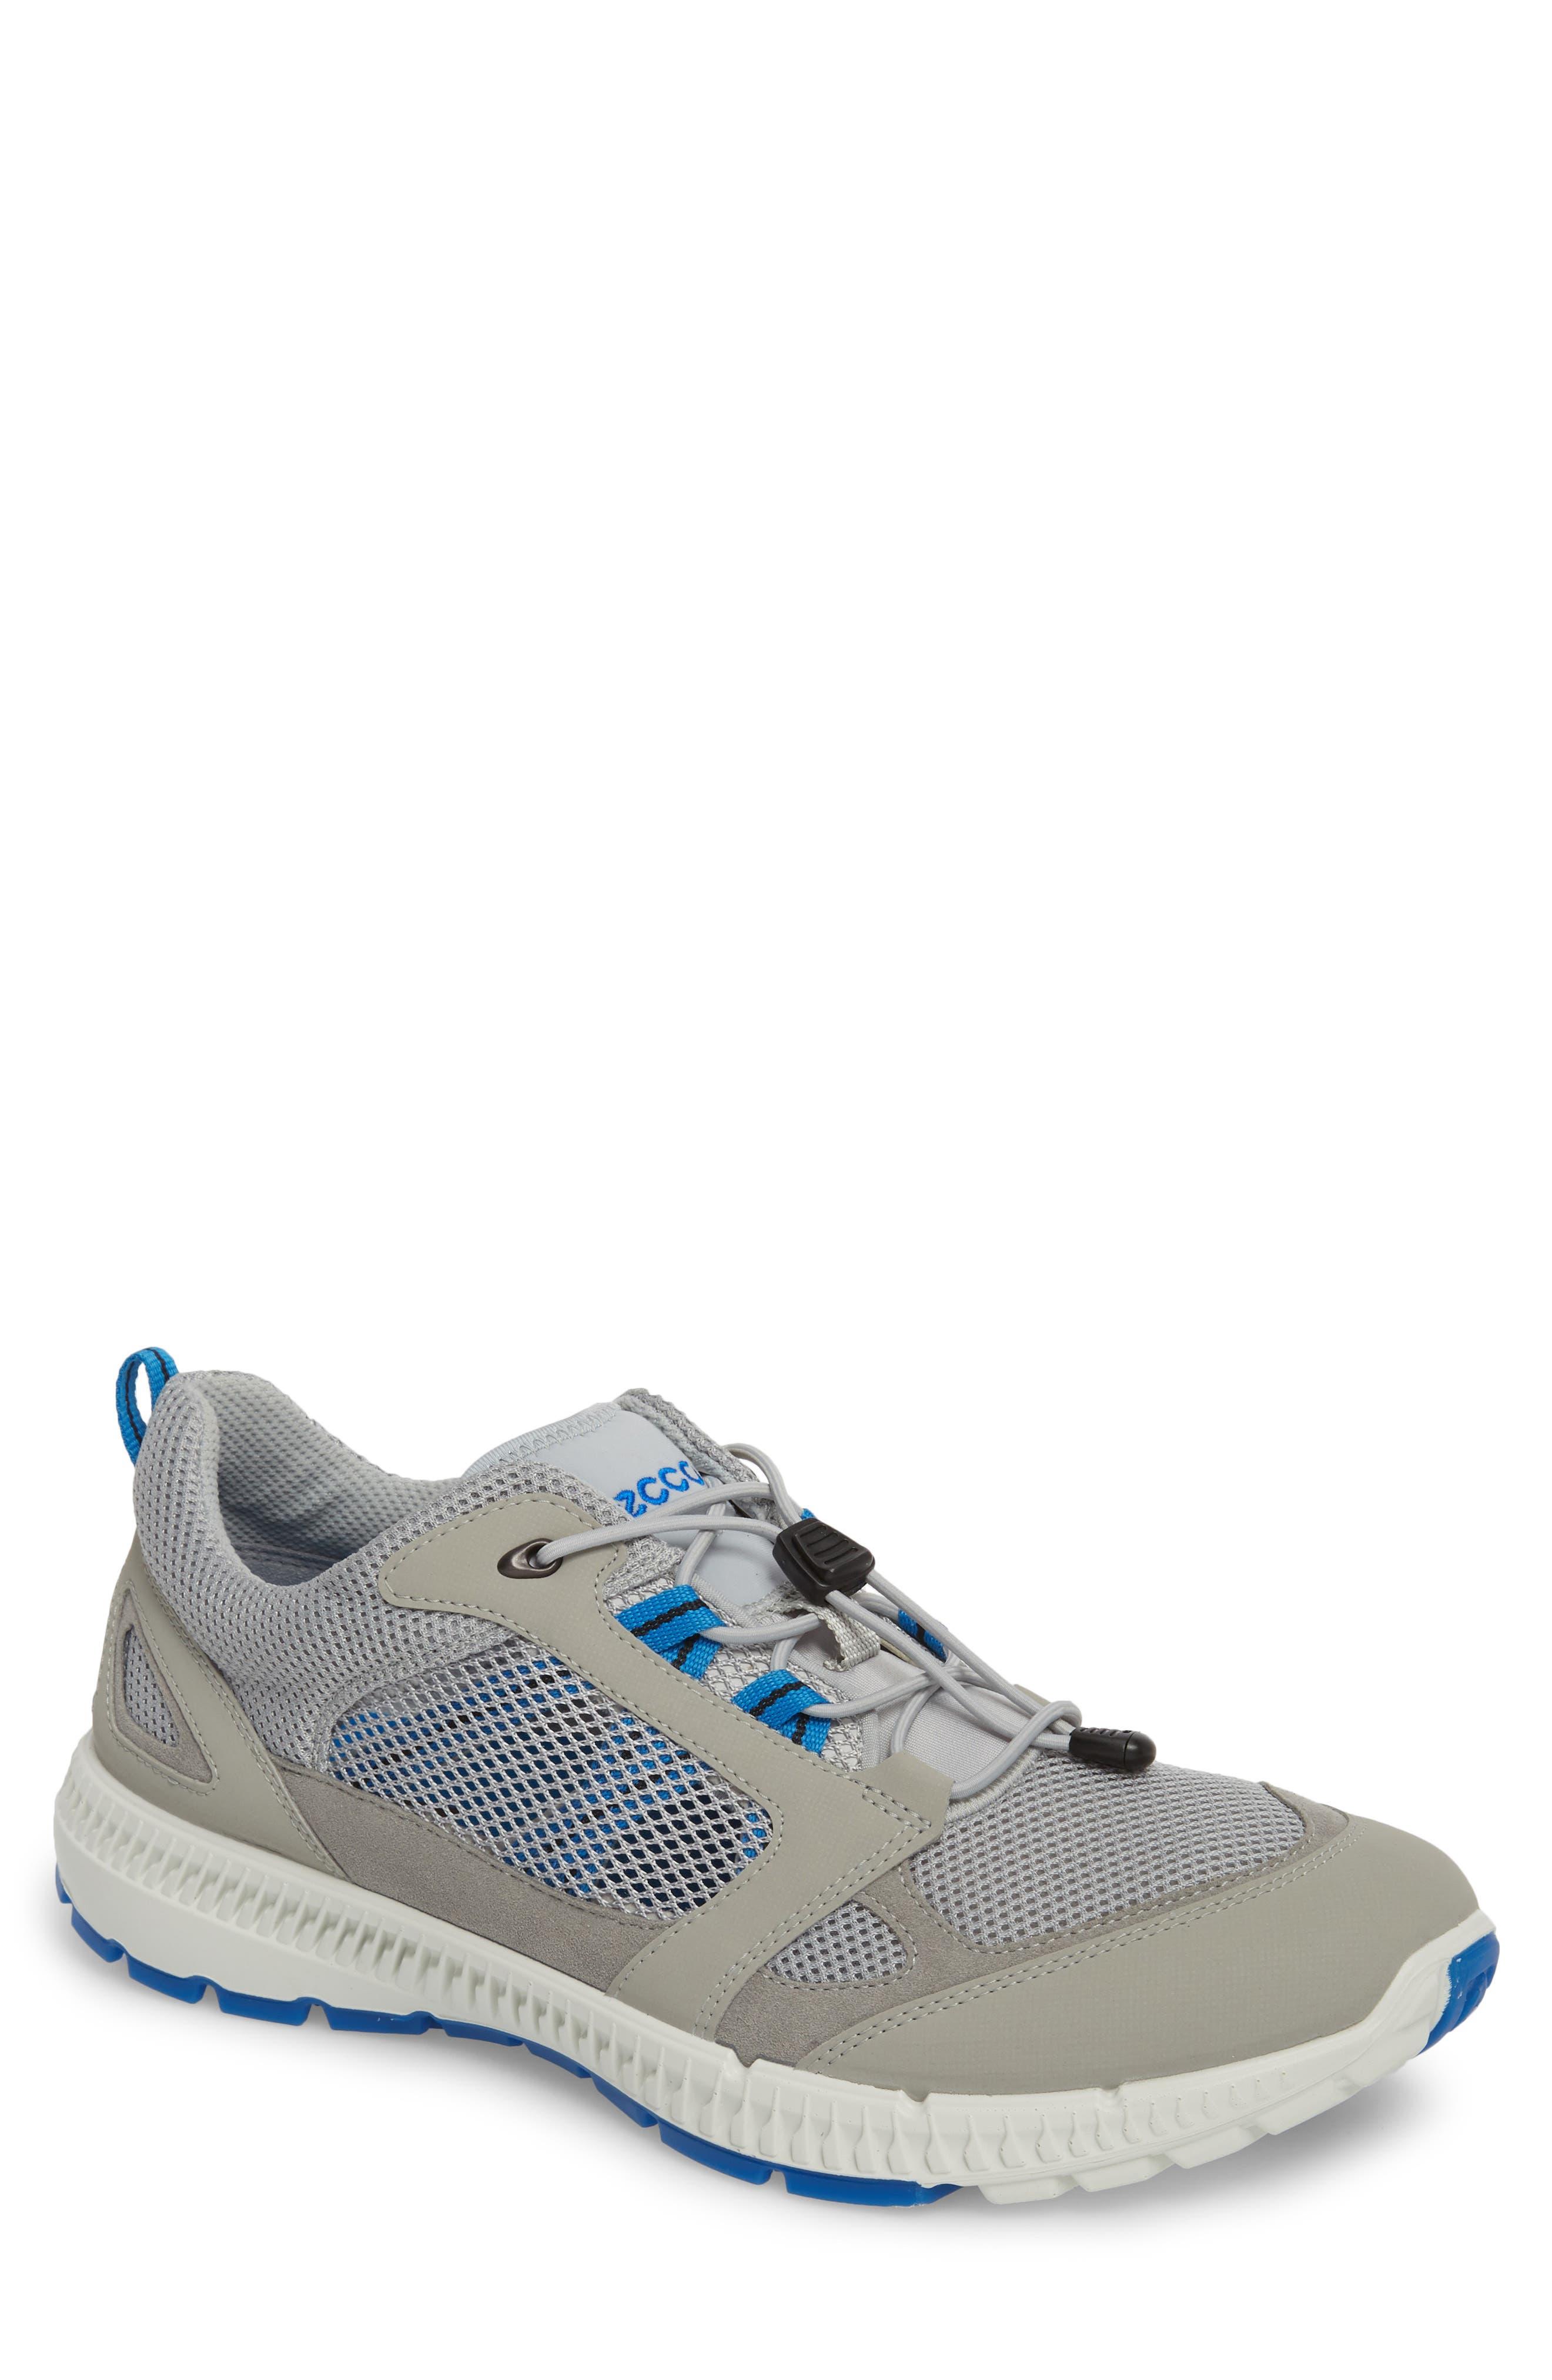 Terracruise II Sneaker,                             Main thumbnail 1, color,                             Wild Dove Leather